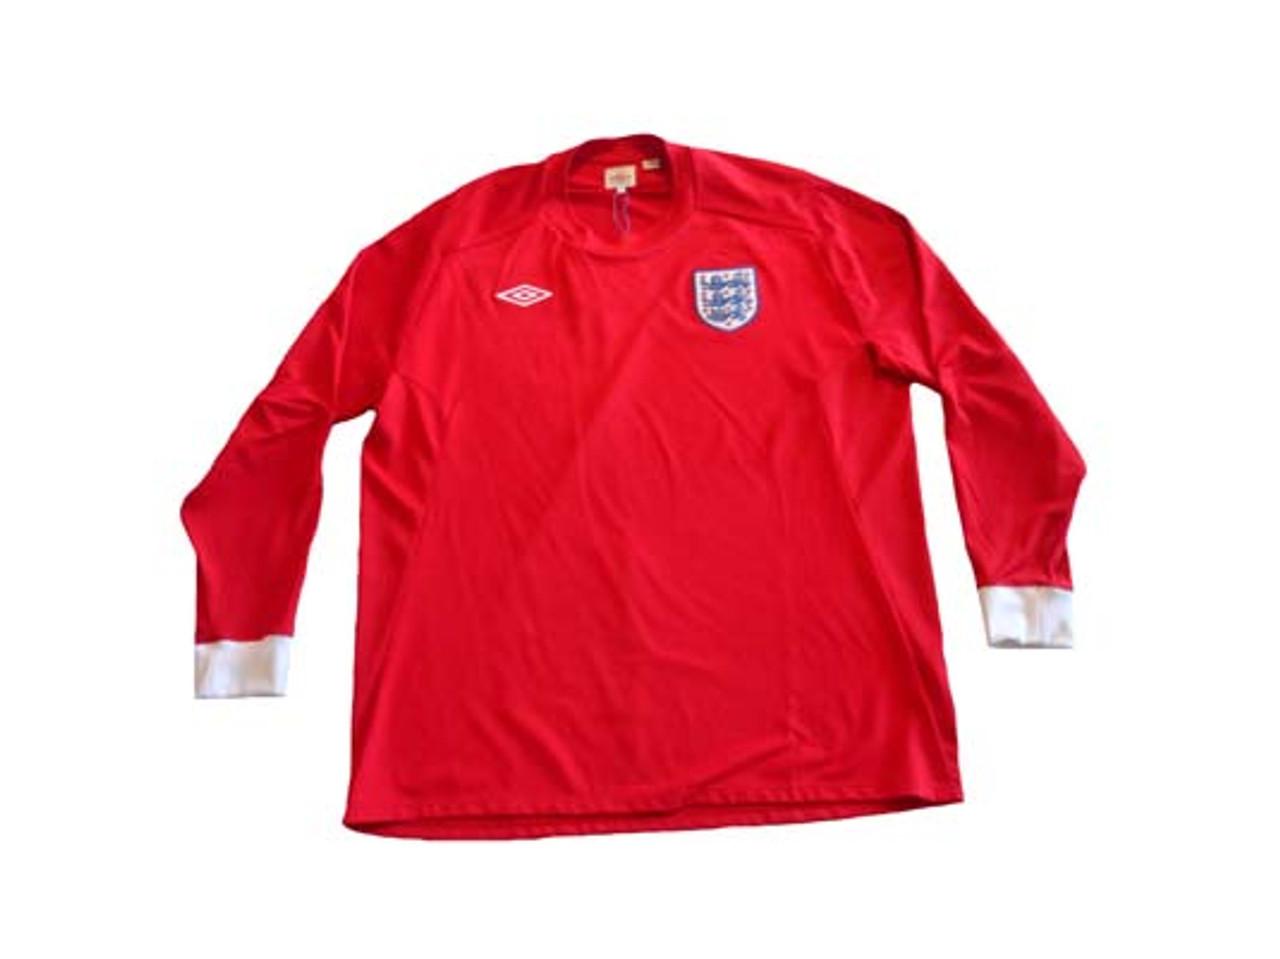 UMBRO ENGLAND 2010 AWAY RED L S JERSEY - Soccer Plus 69cb96e68